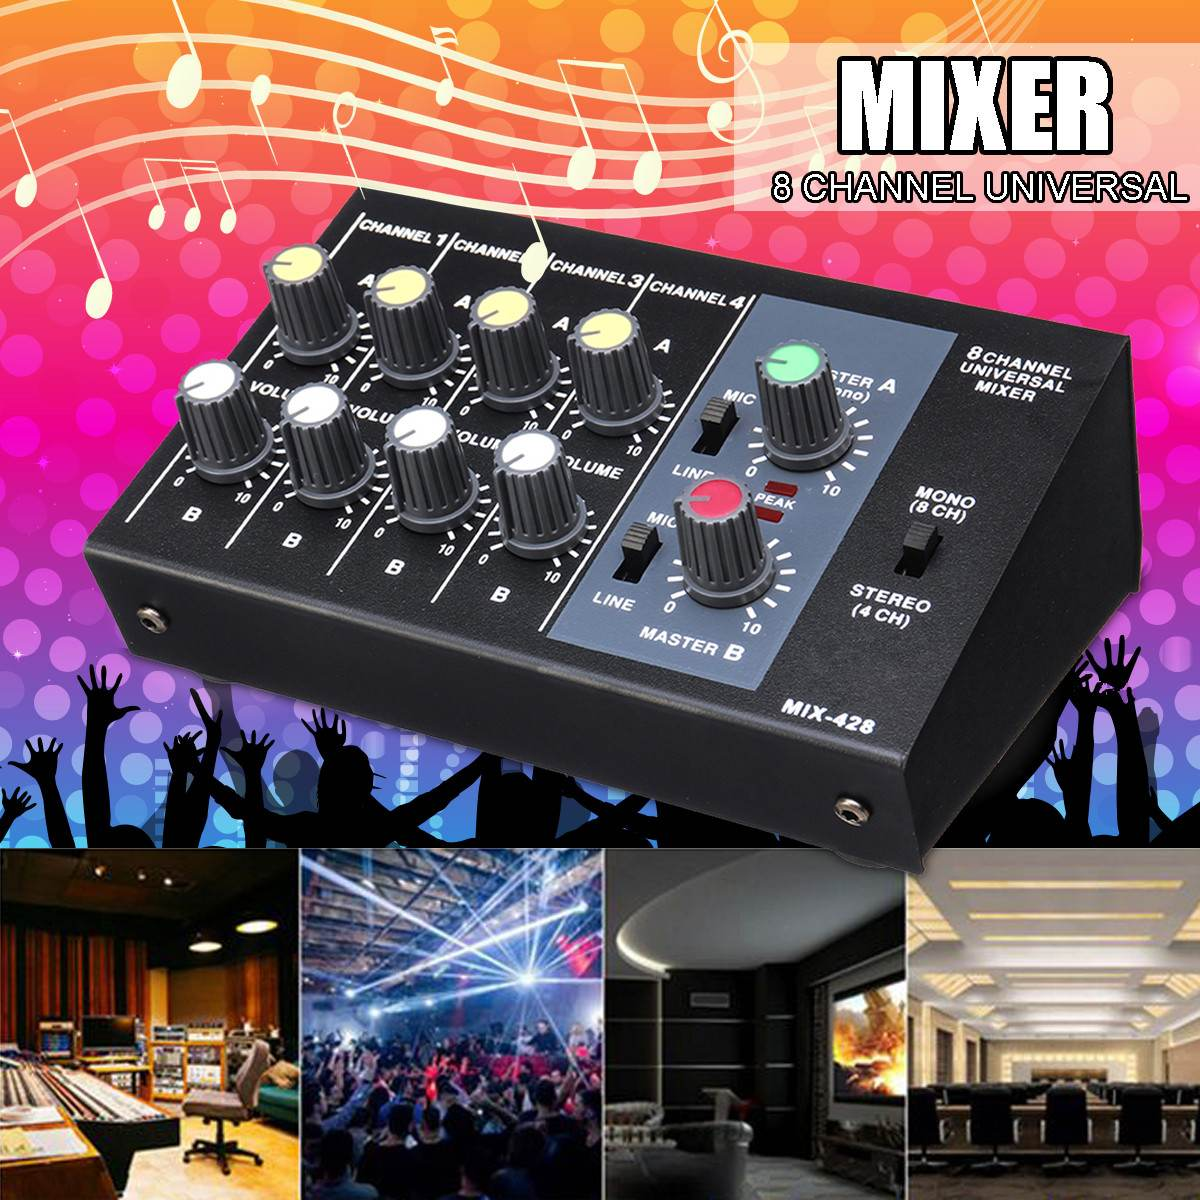 5W 48V Multi-Kanal Digital Mixing Konsole Karaoke Universal Mixer Konsole Mono/Stereo Mikrofon Mischer Konsole anpassung Panel